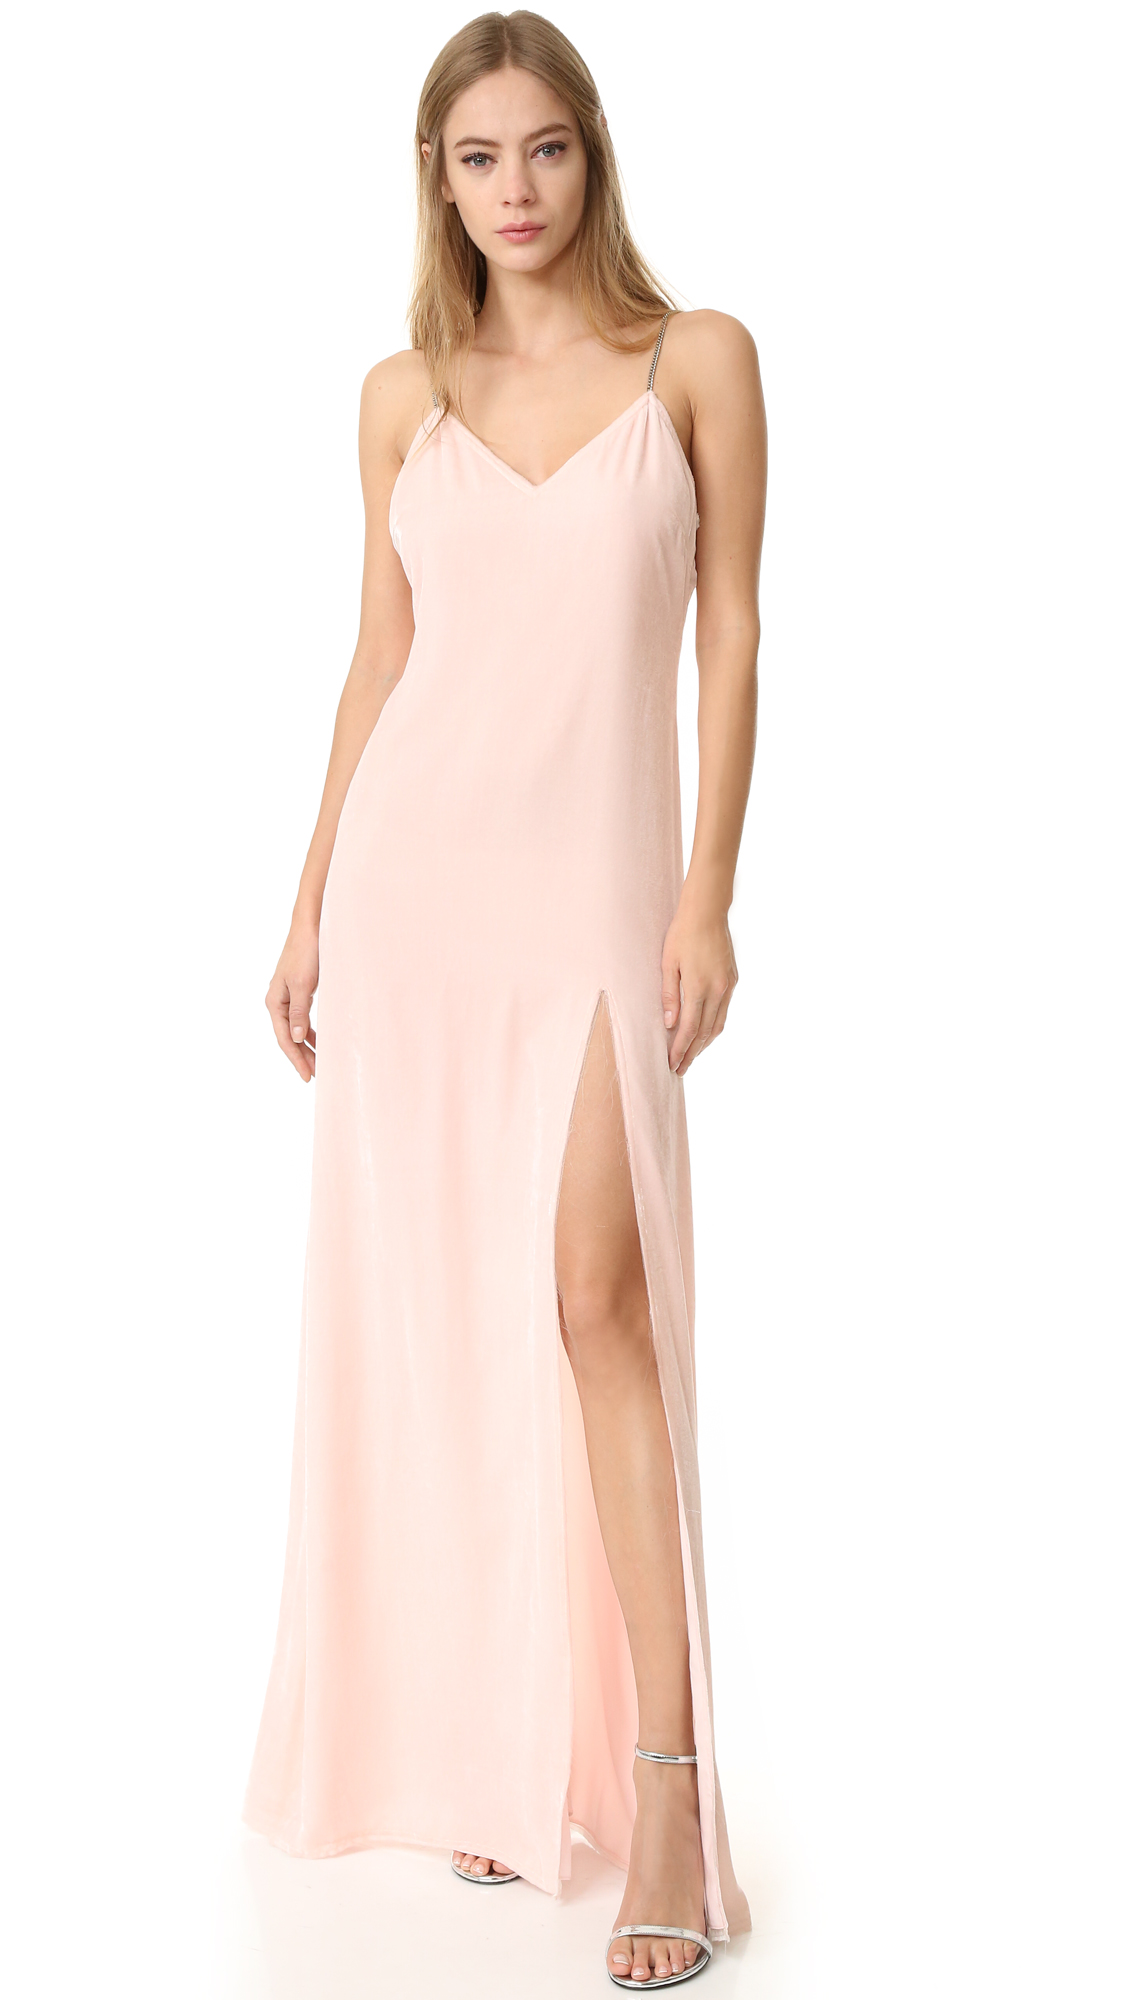 Baja East Sleeveless Gown - Light Pink